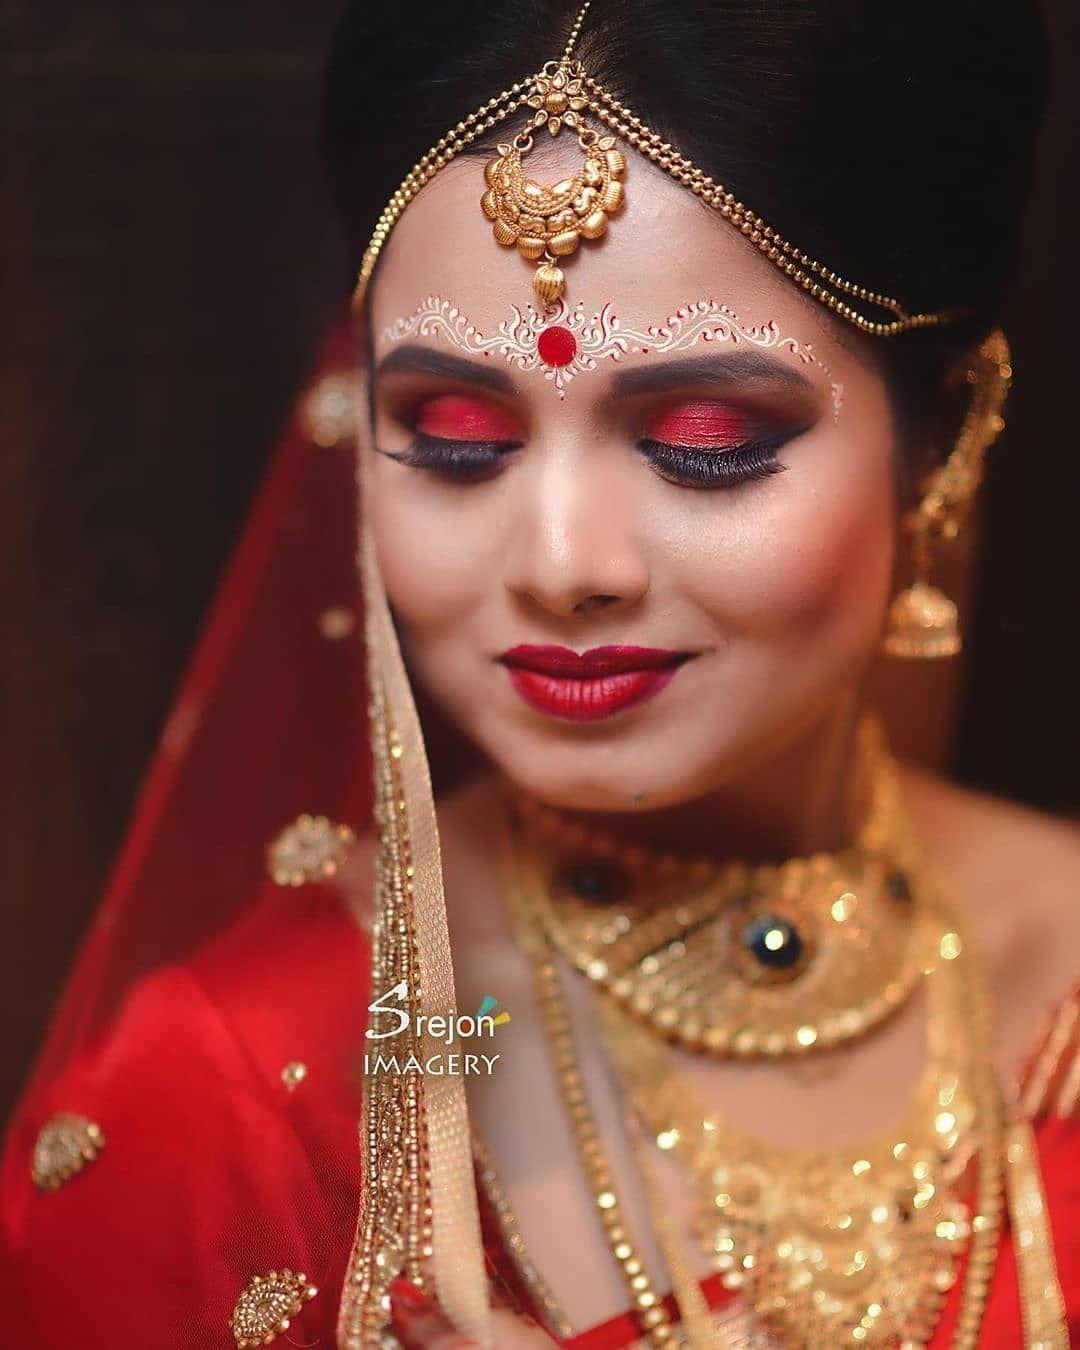 10 Bengali Bridal Kumkum Chandan Designs That Are Khuba Sundara Bridal Bride Look Bridal Looks